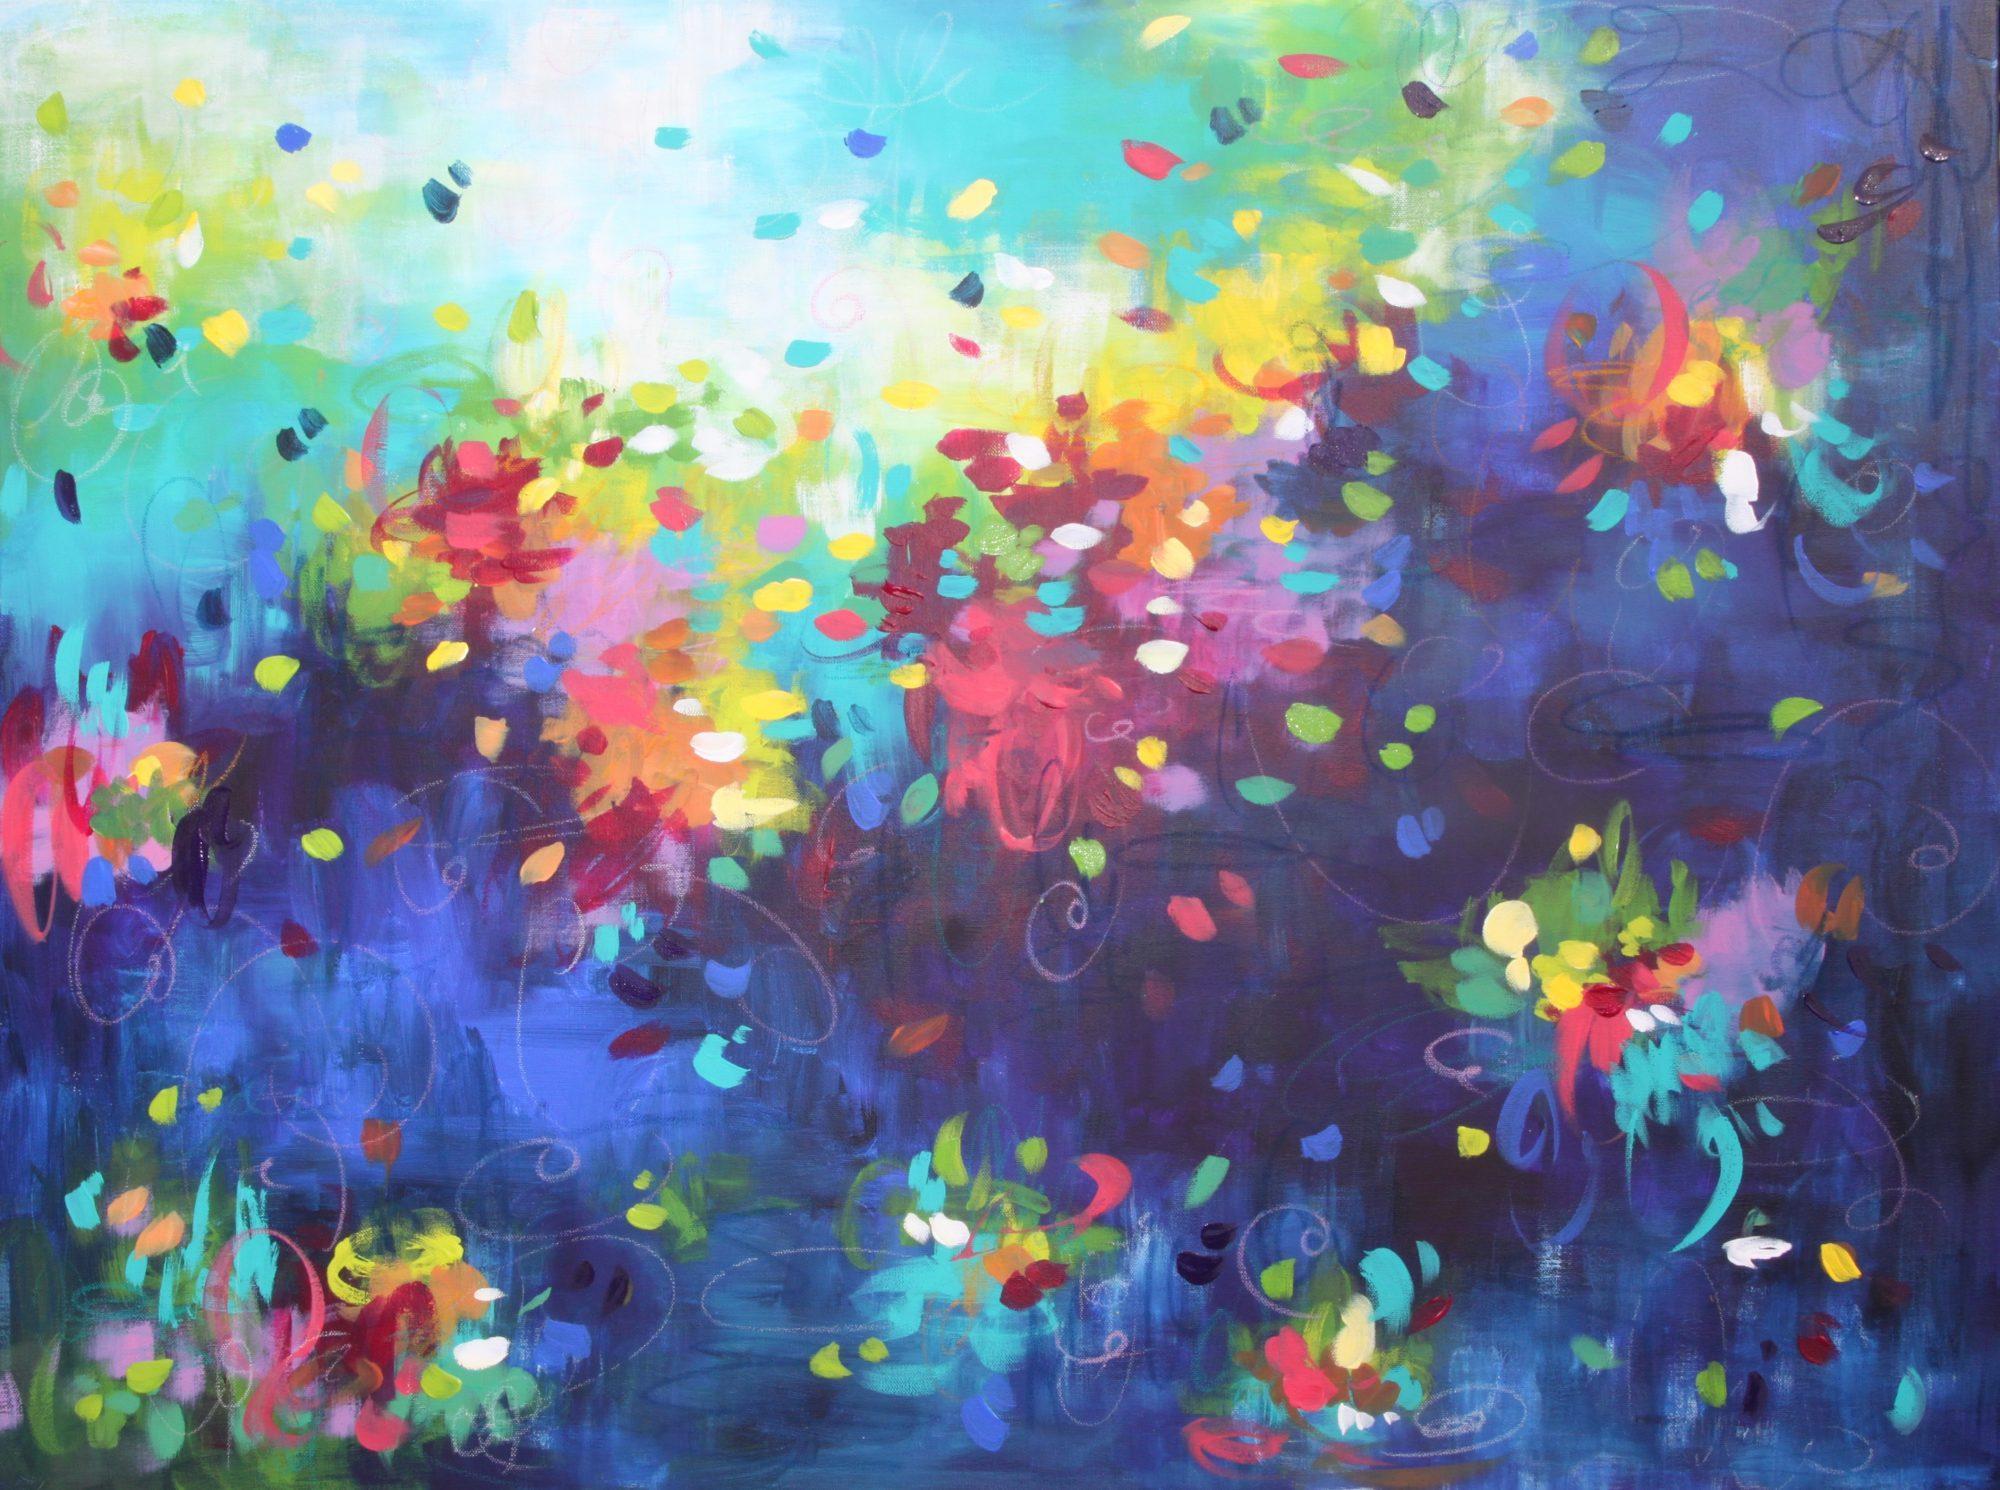 belinda-nadwie-art-abstract-painting-rendezvous